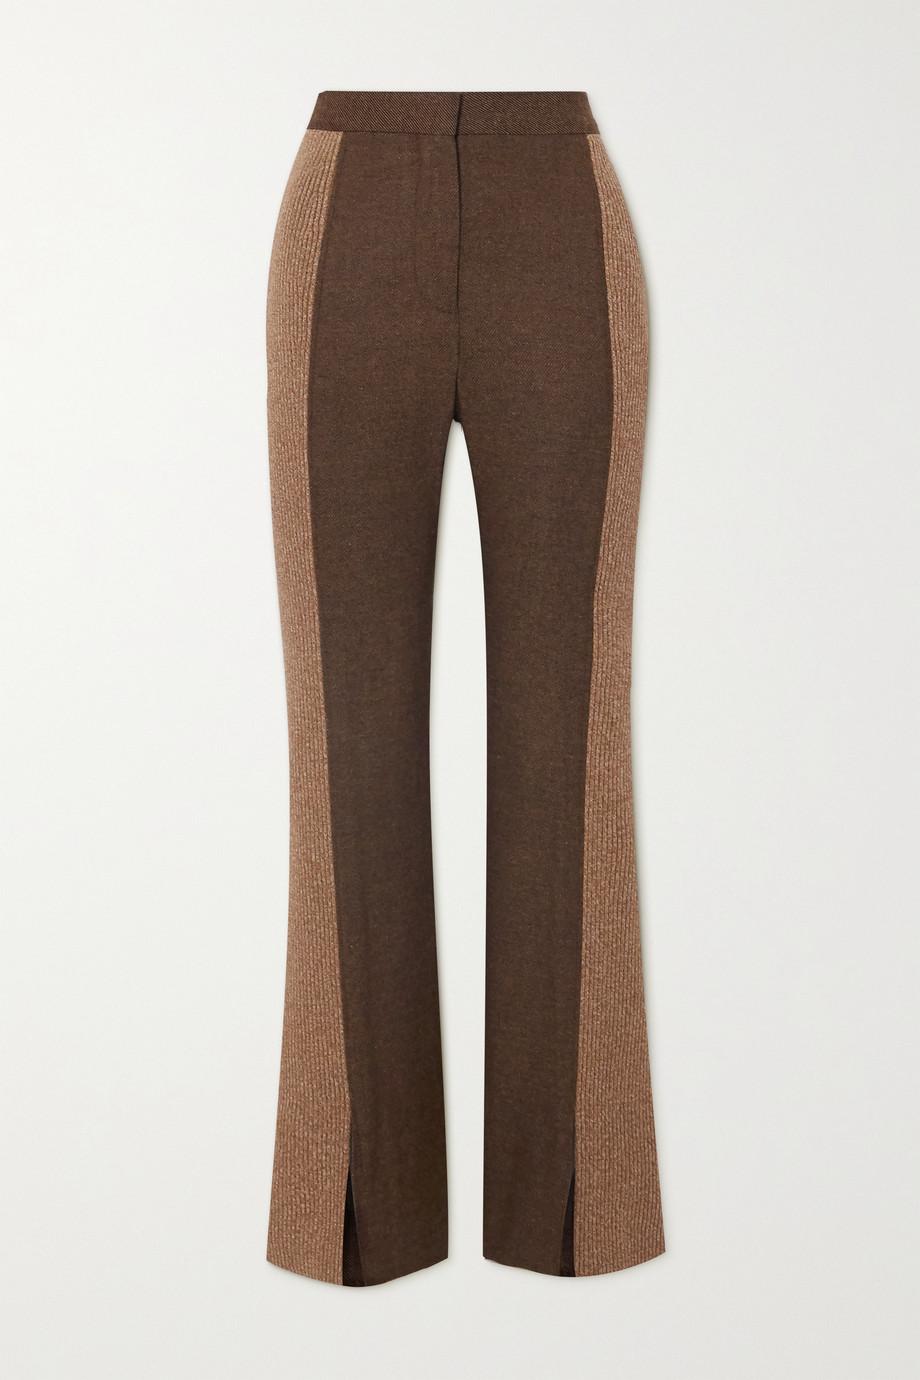 Burberry Paneled wool-blend slim-leg pants